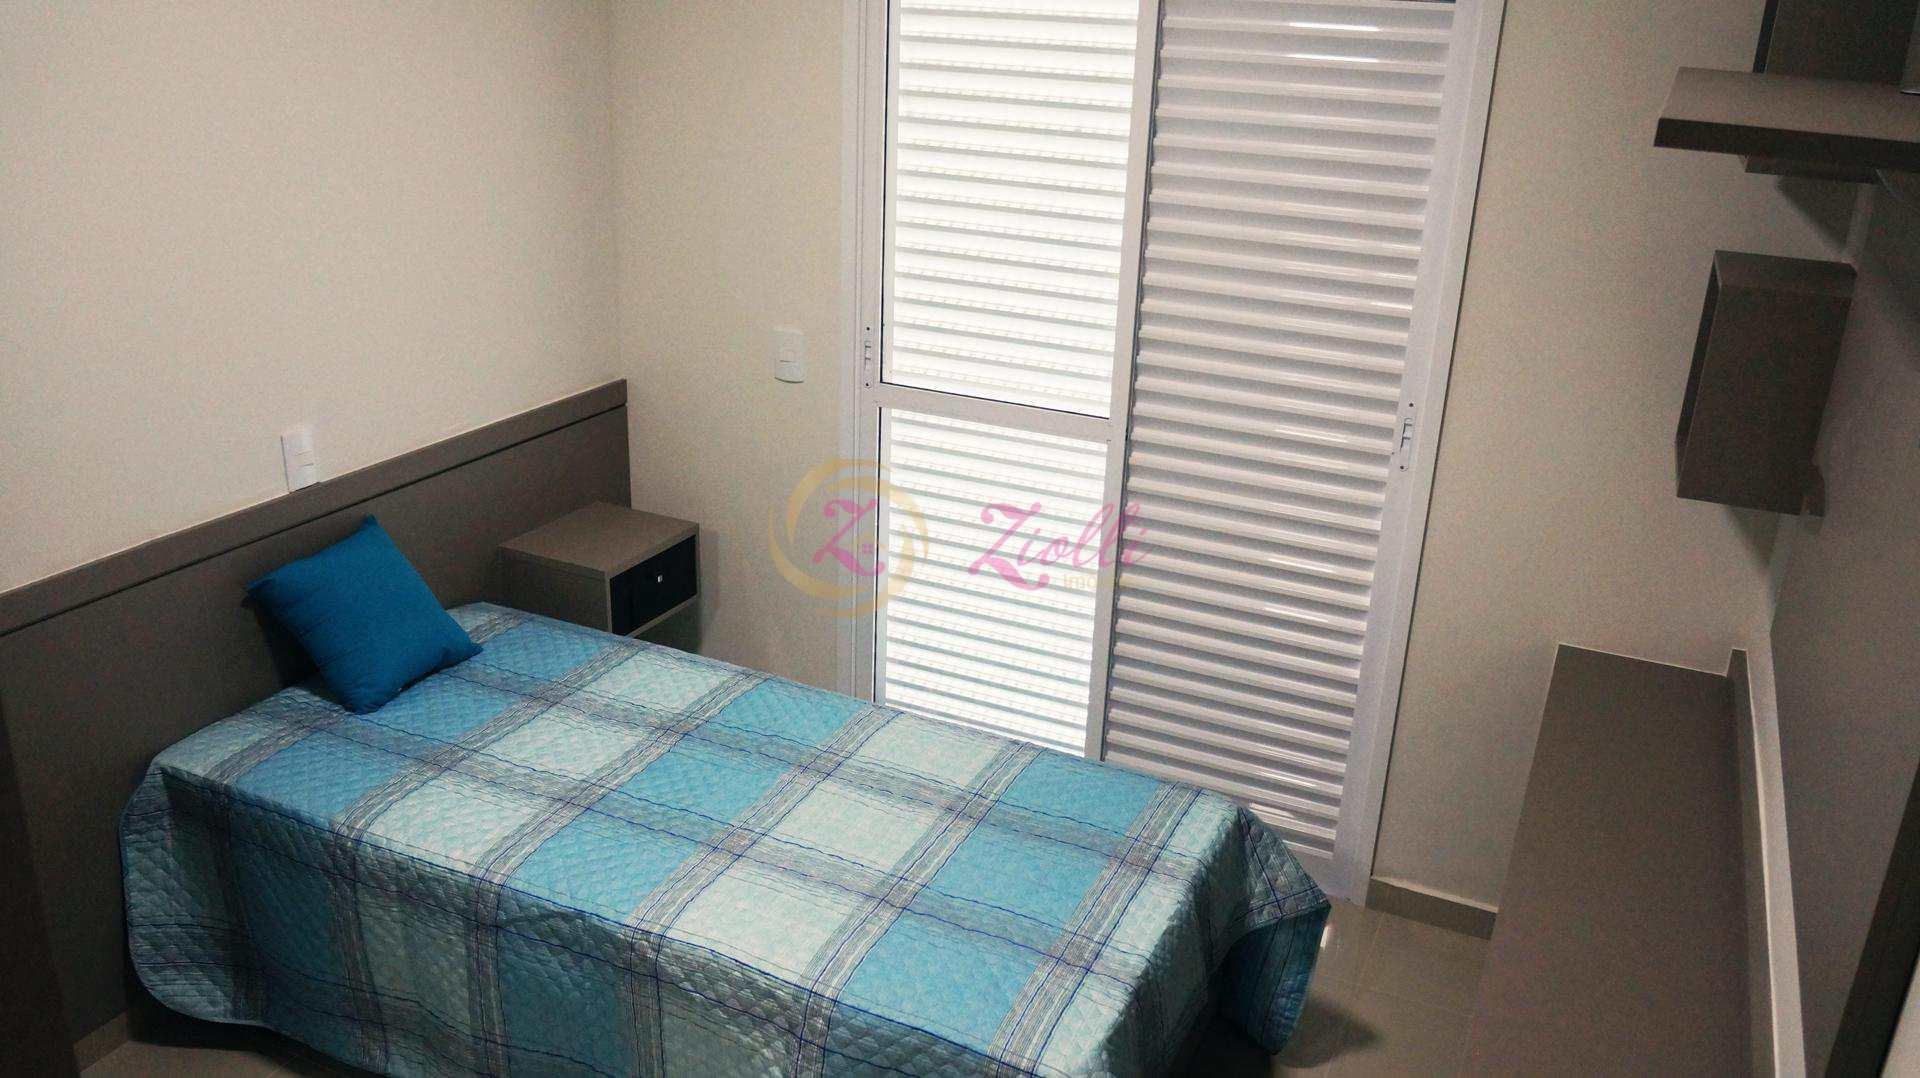 Dormitorio02-02